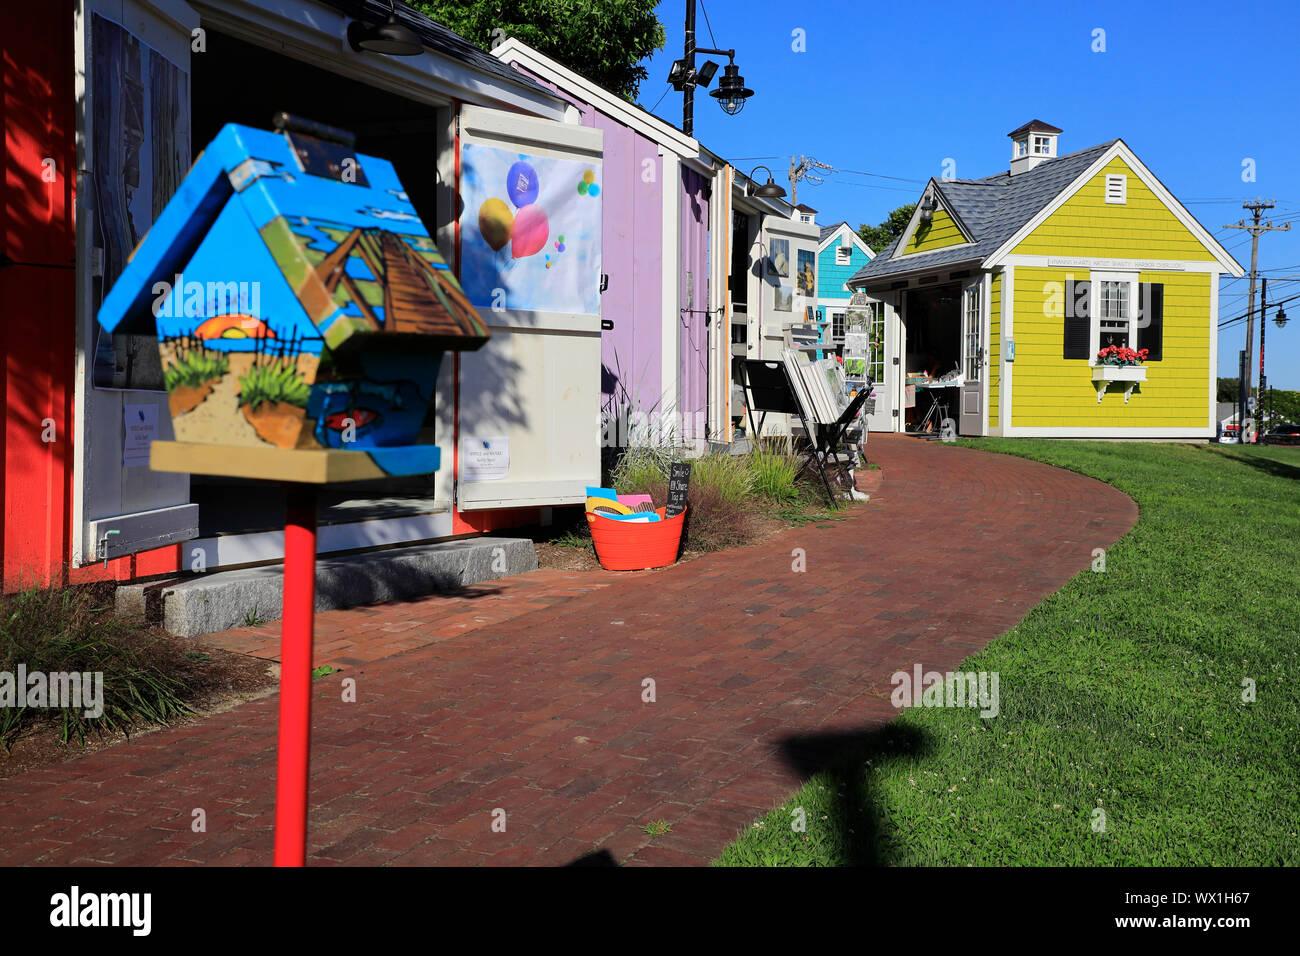 Hyannis Hyarts Artista Barracas.Hyannis.Cape Cod.Massachusetts.EE.UU. Foto de stock